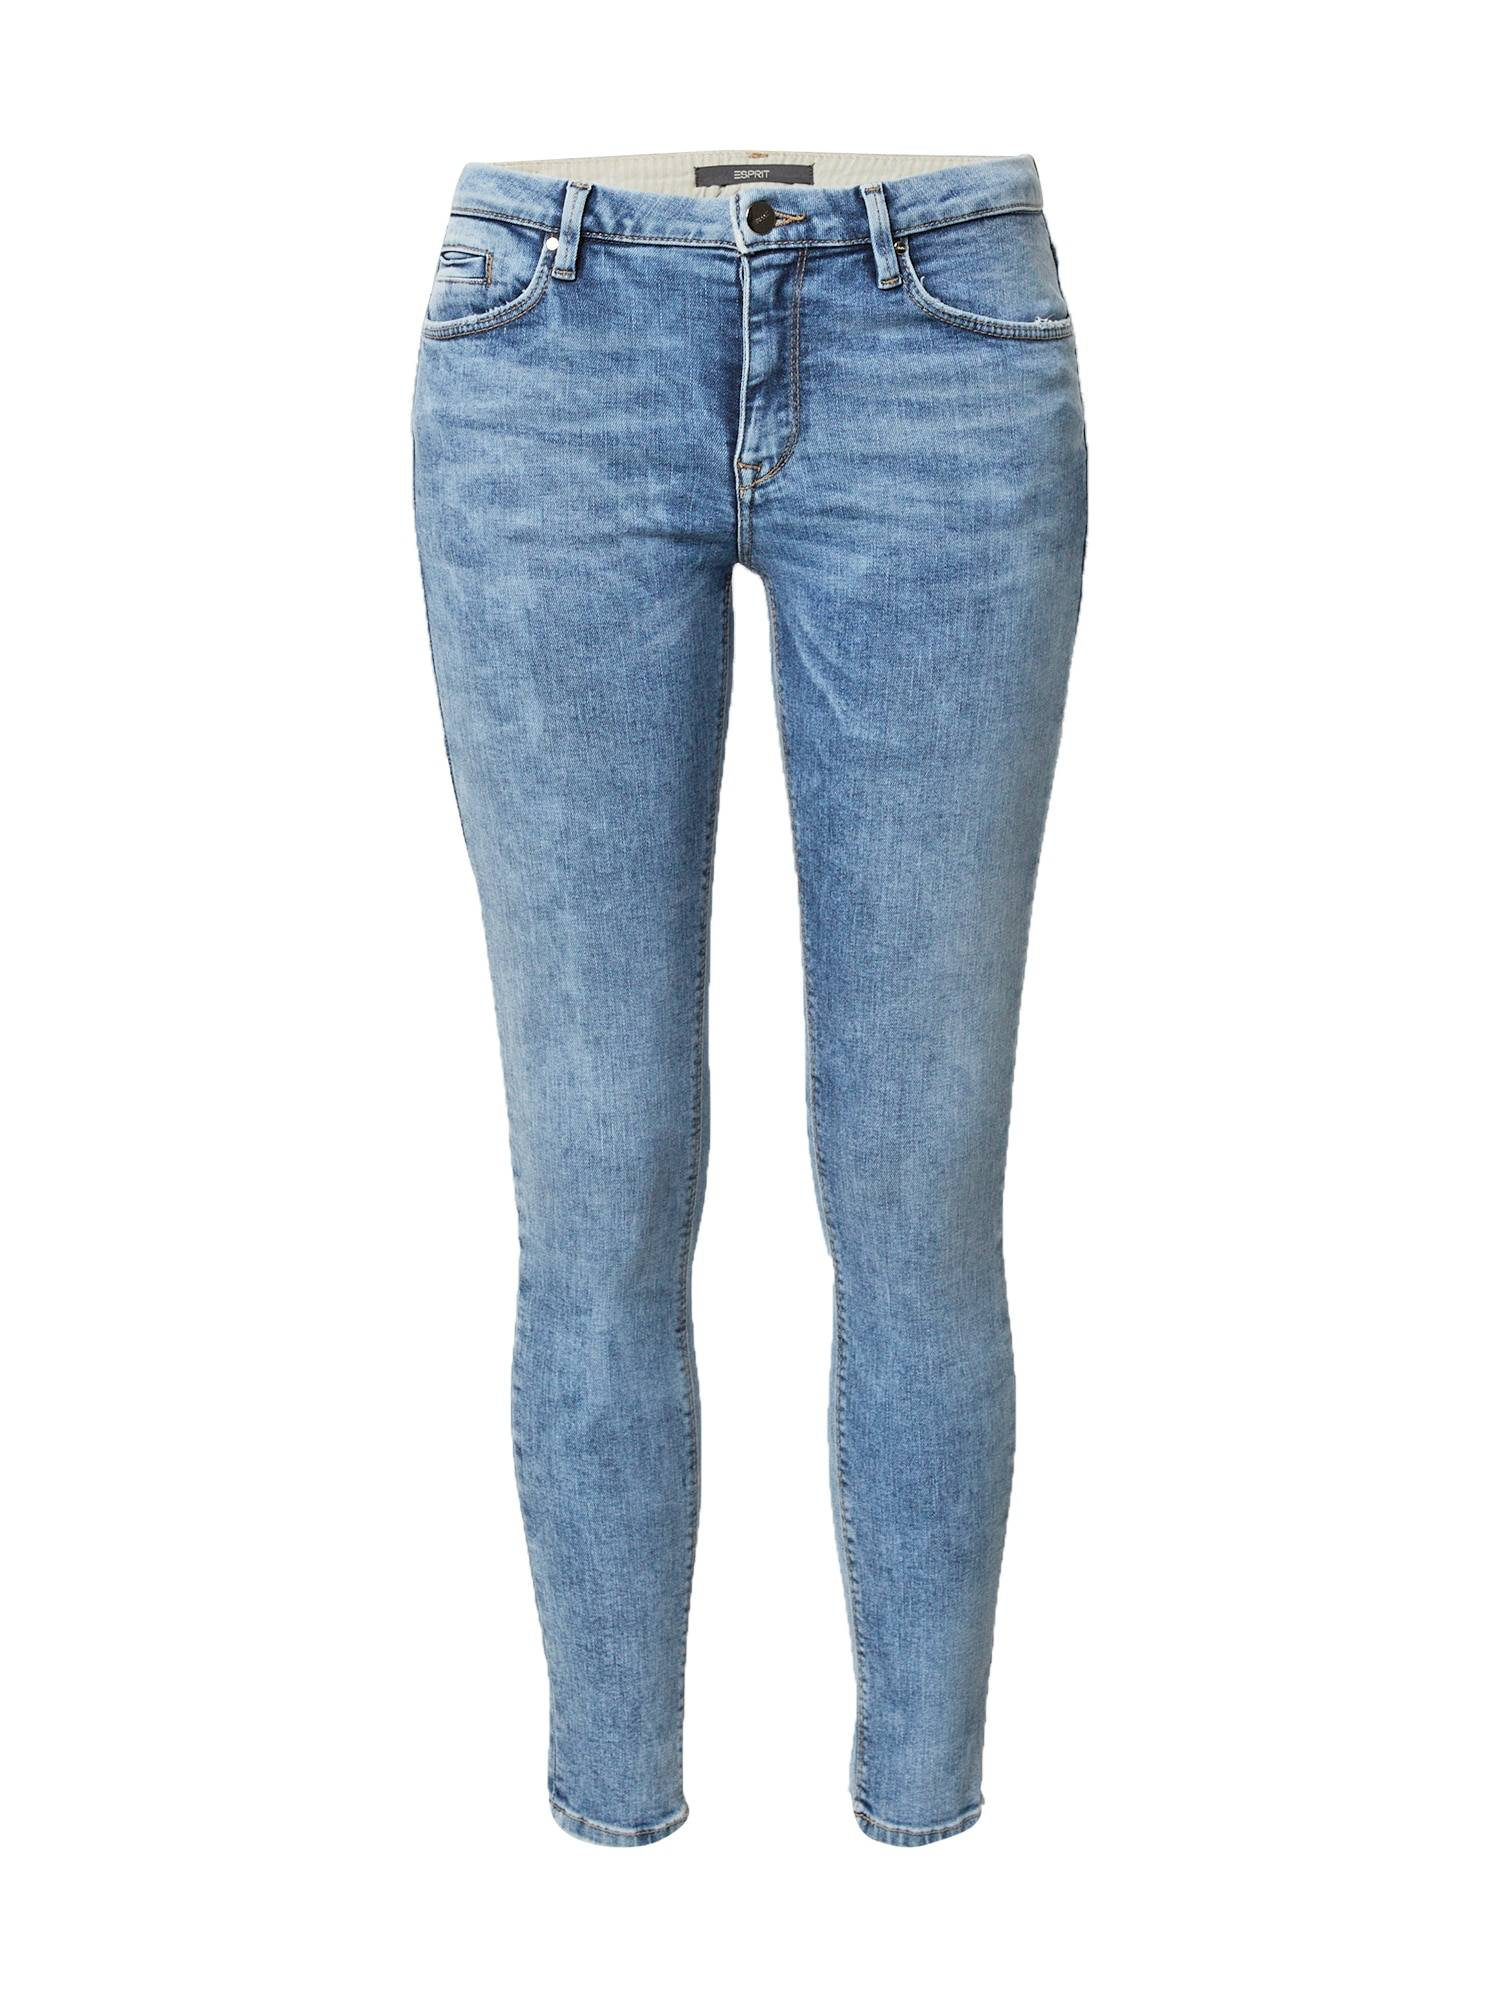 Esprit Jean  - Bleu - Taille: 32 - female